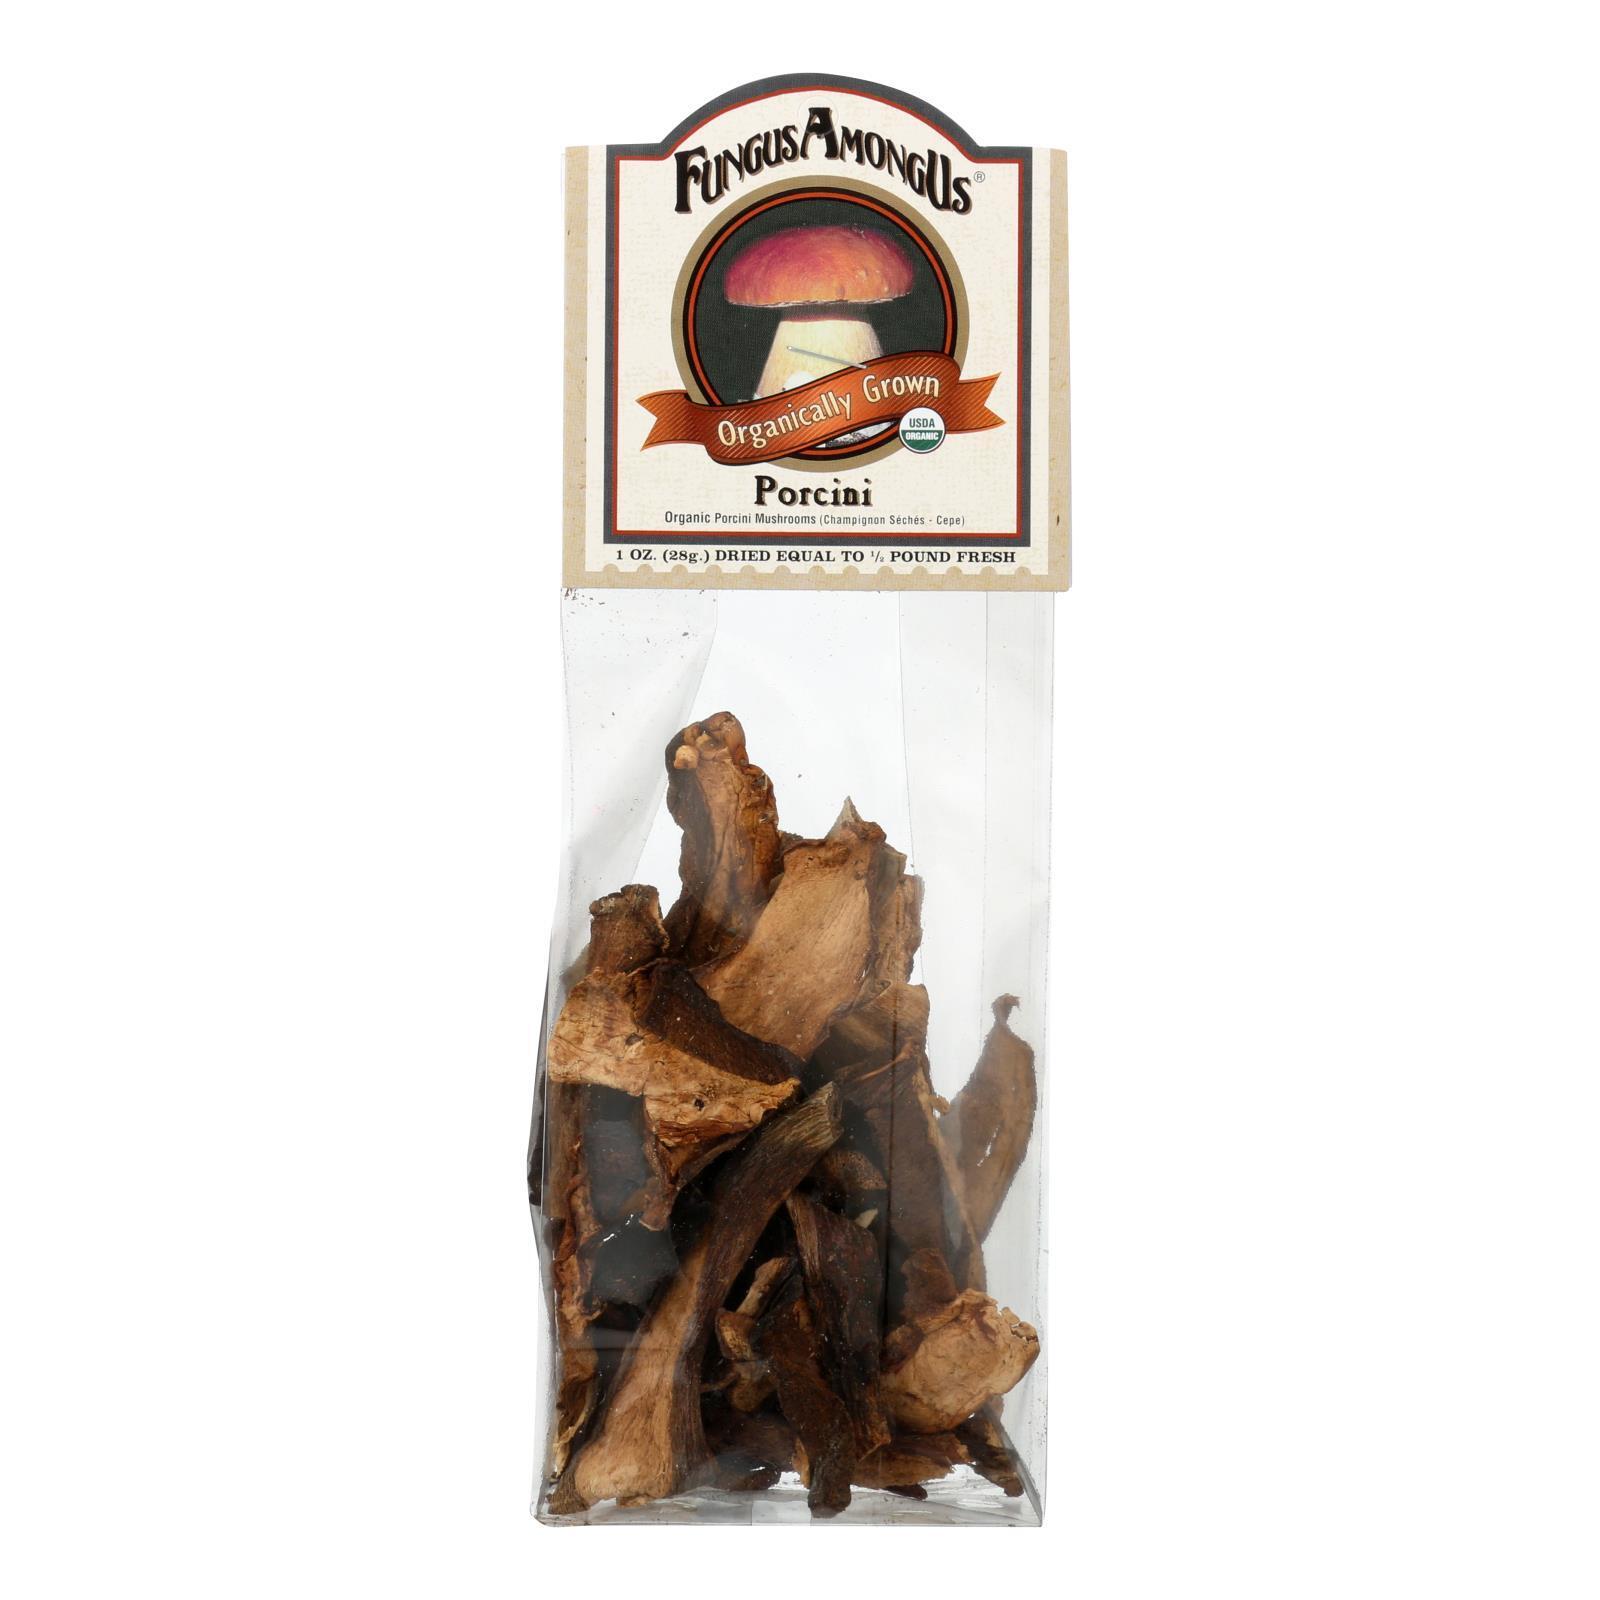 Fungus Among Us Organic Porcini Mushrooms - Mushrooms - Case of 8 - 1 oz.